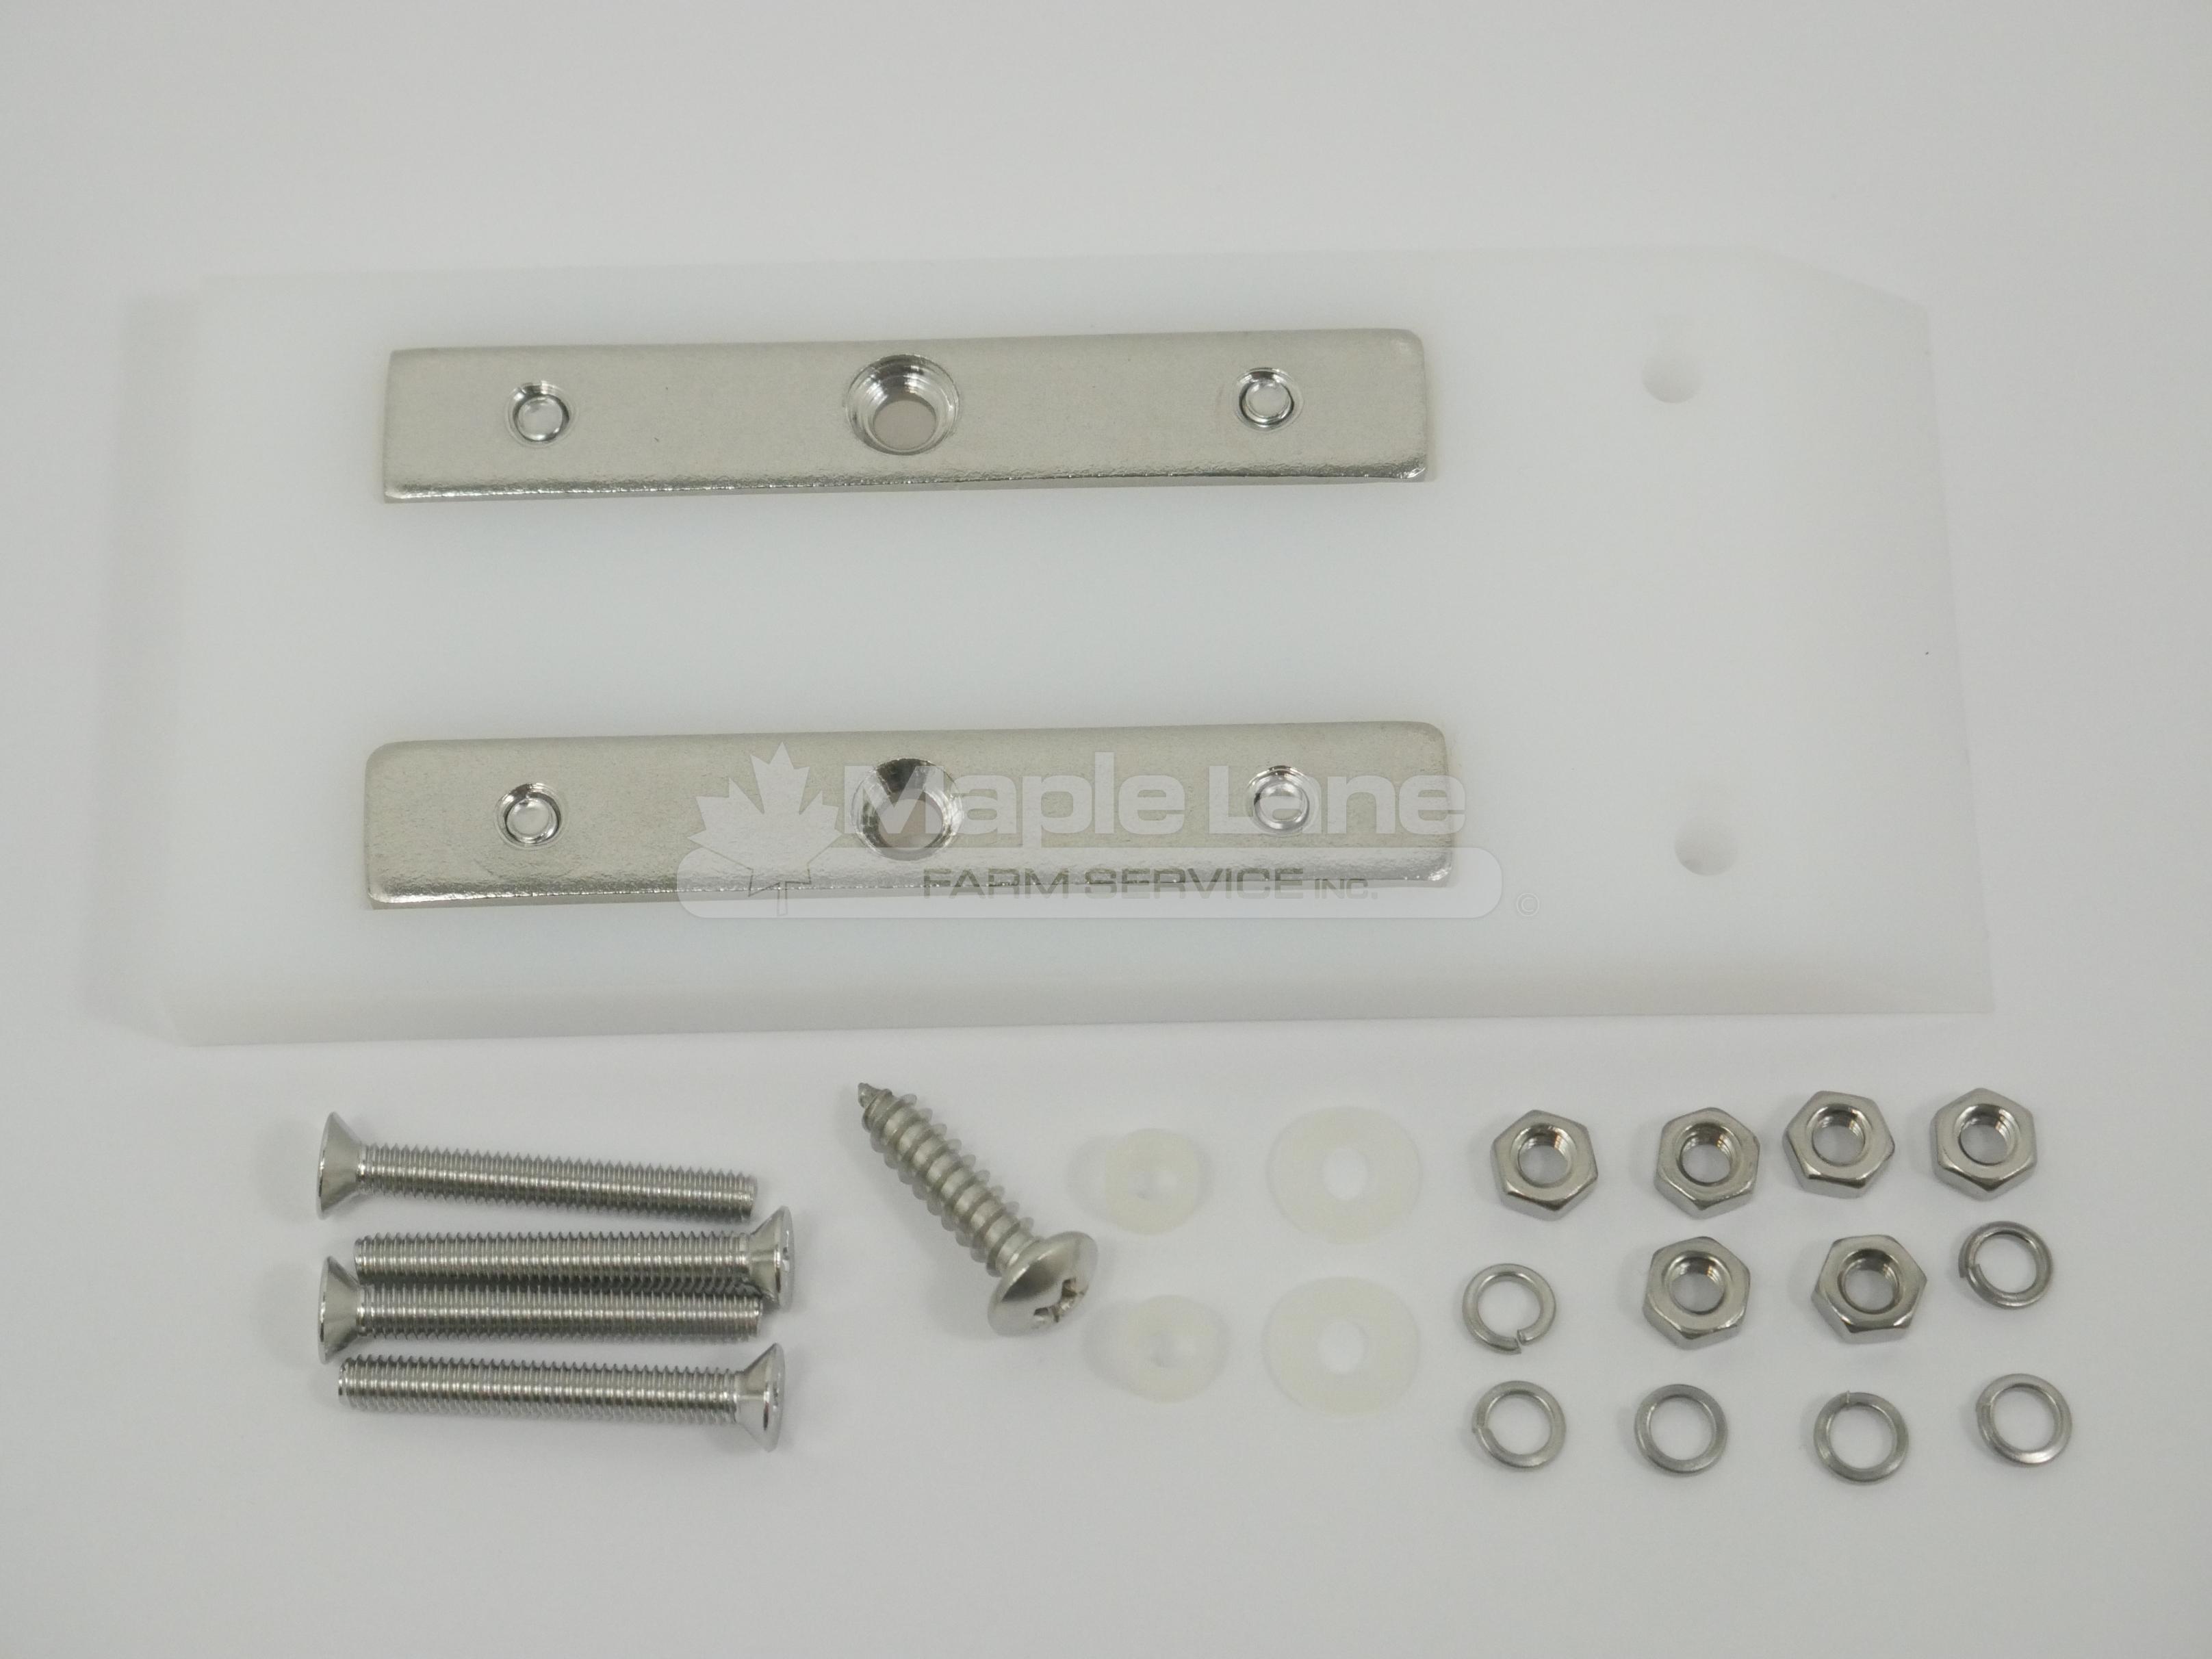 FXS0302 Sensor Pad Kit